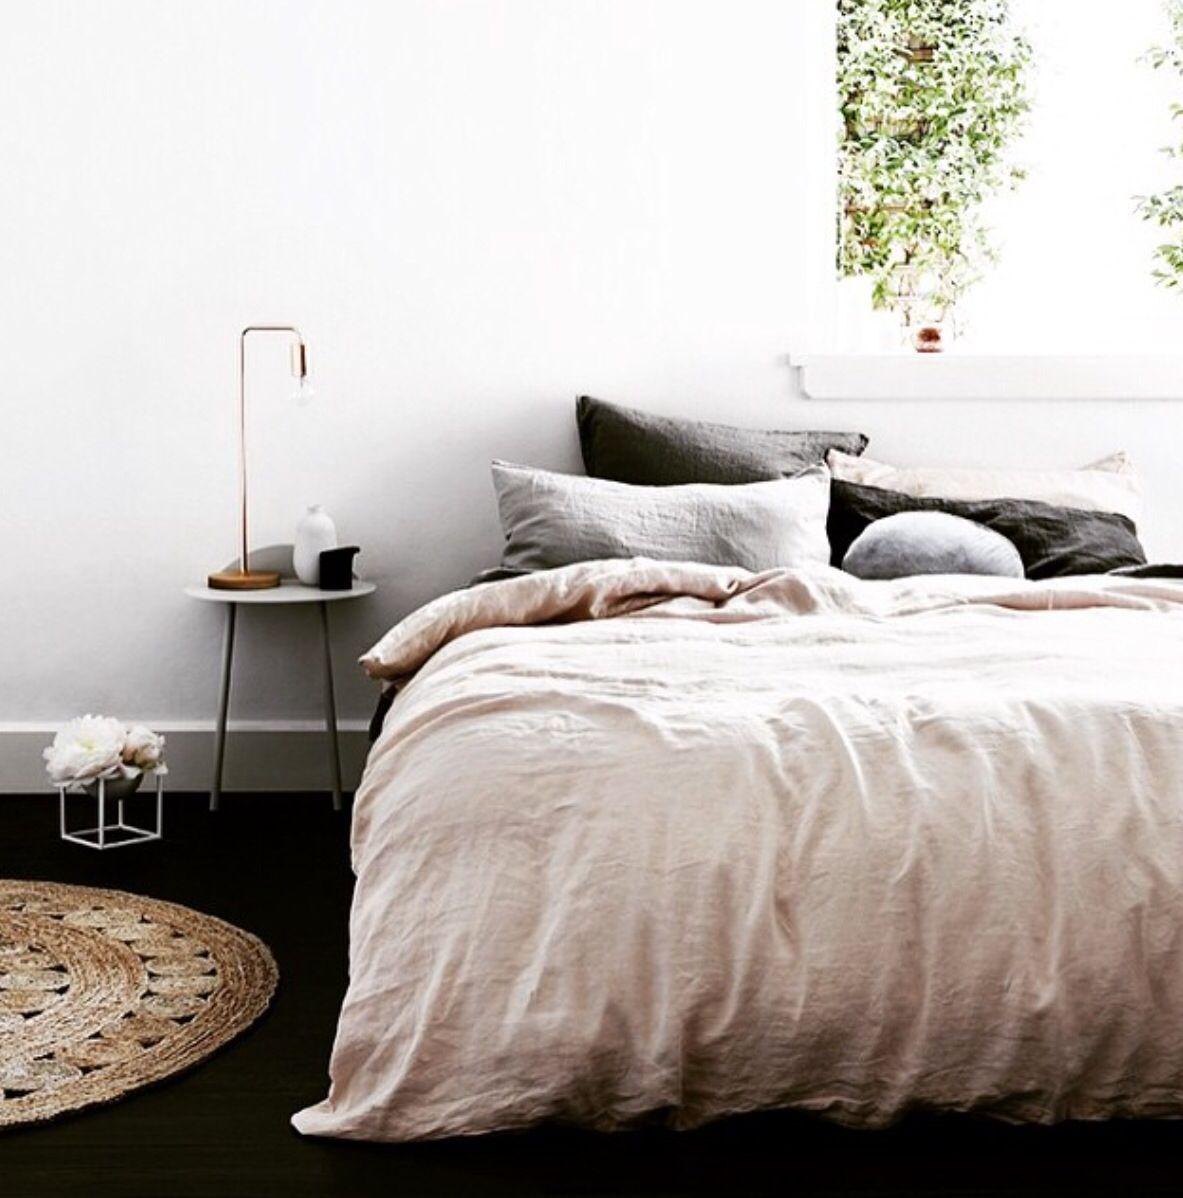 Oud-roze   Slaapkamer   Pinterest   Bedrooms and Decorating